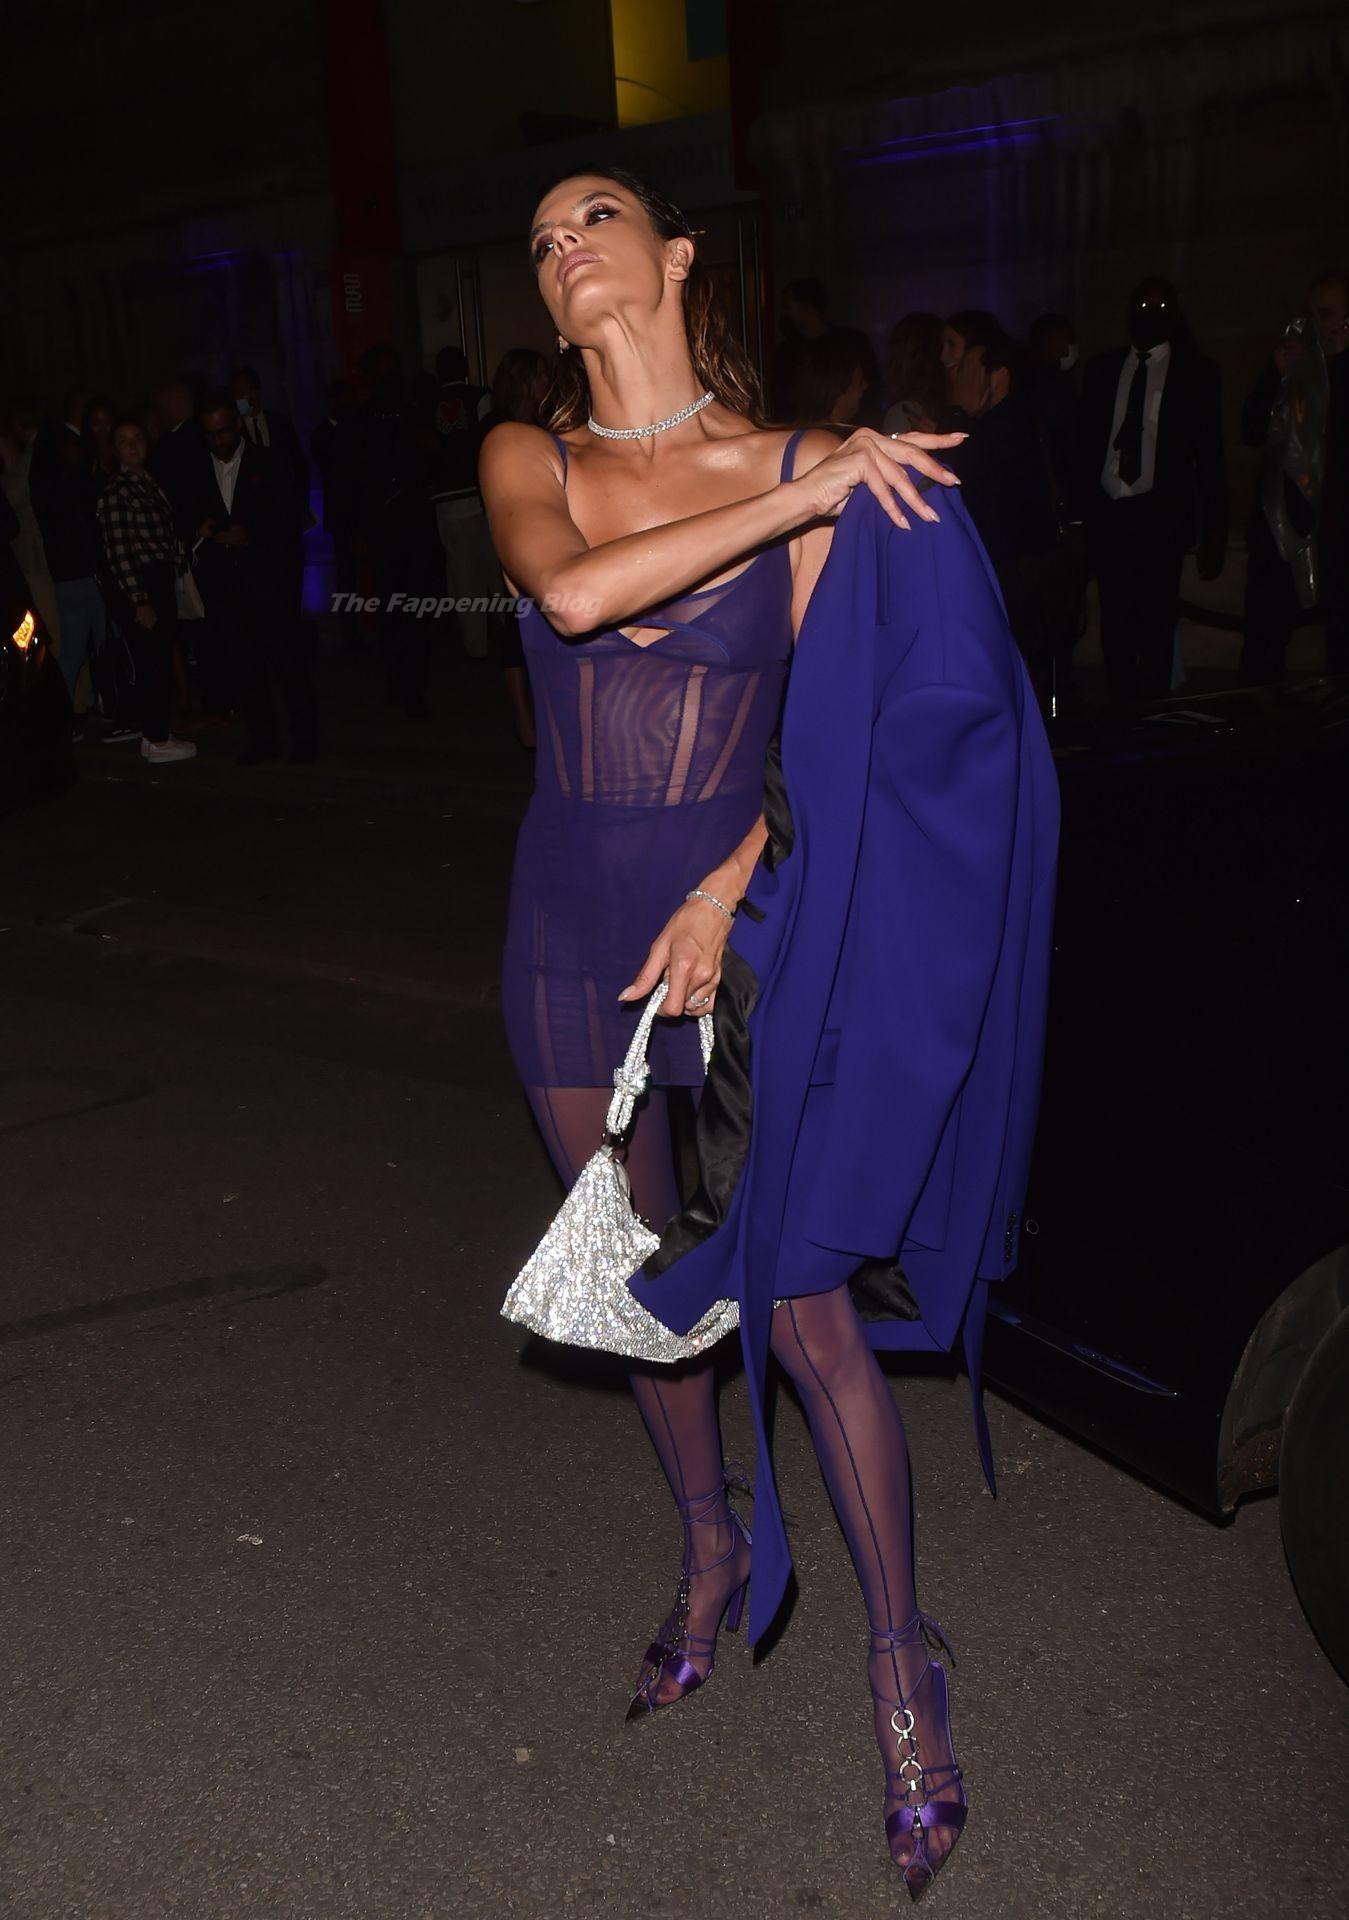 Alessandra-Ambrosio-Sexy-The-Fappening-Blog-77-1.jpg